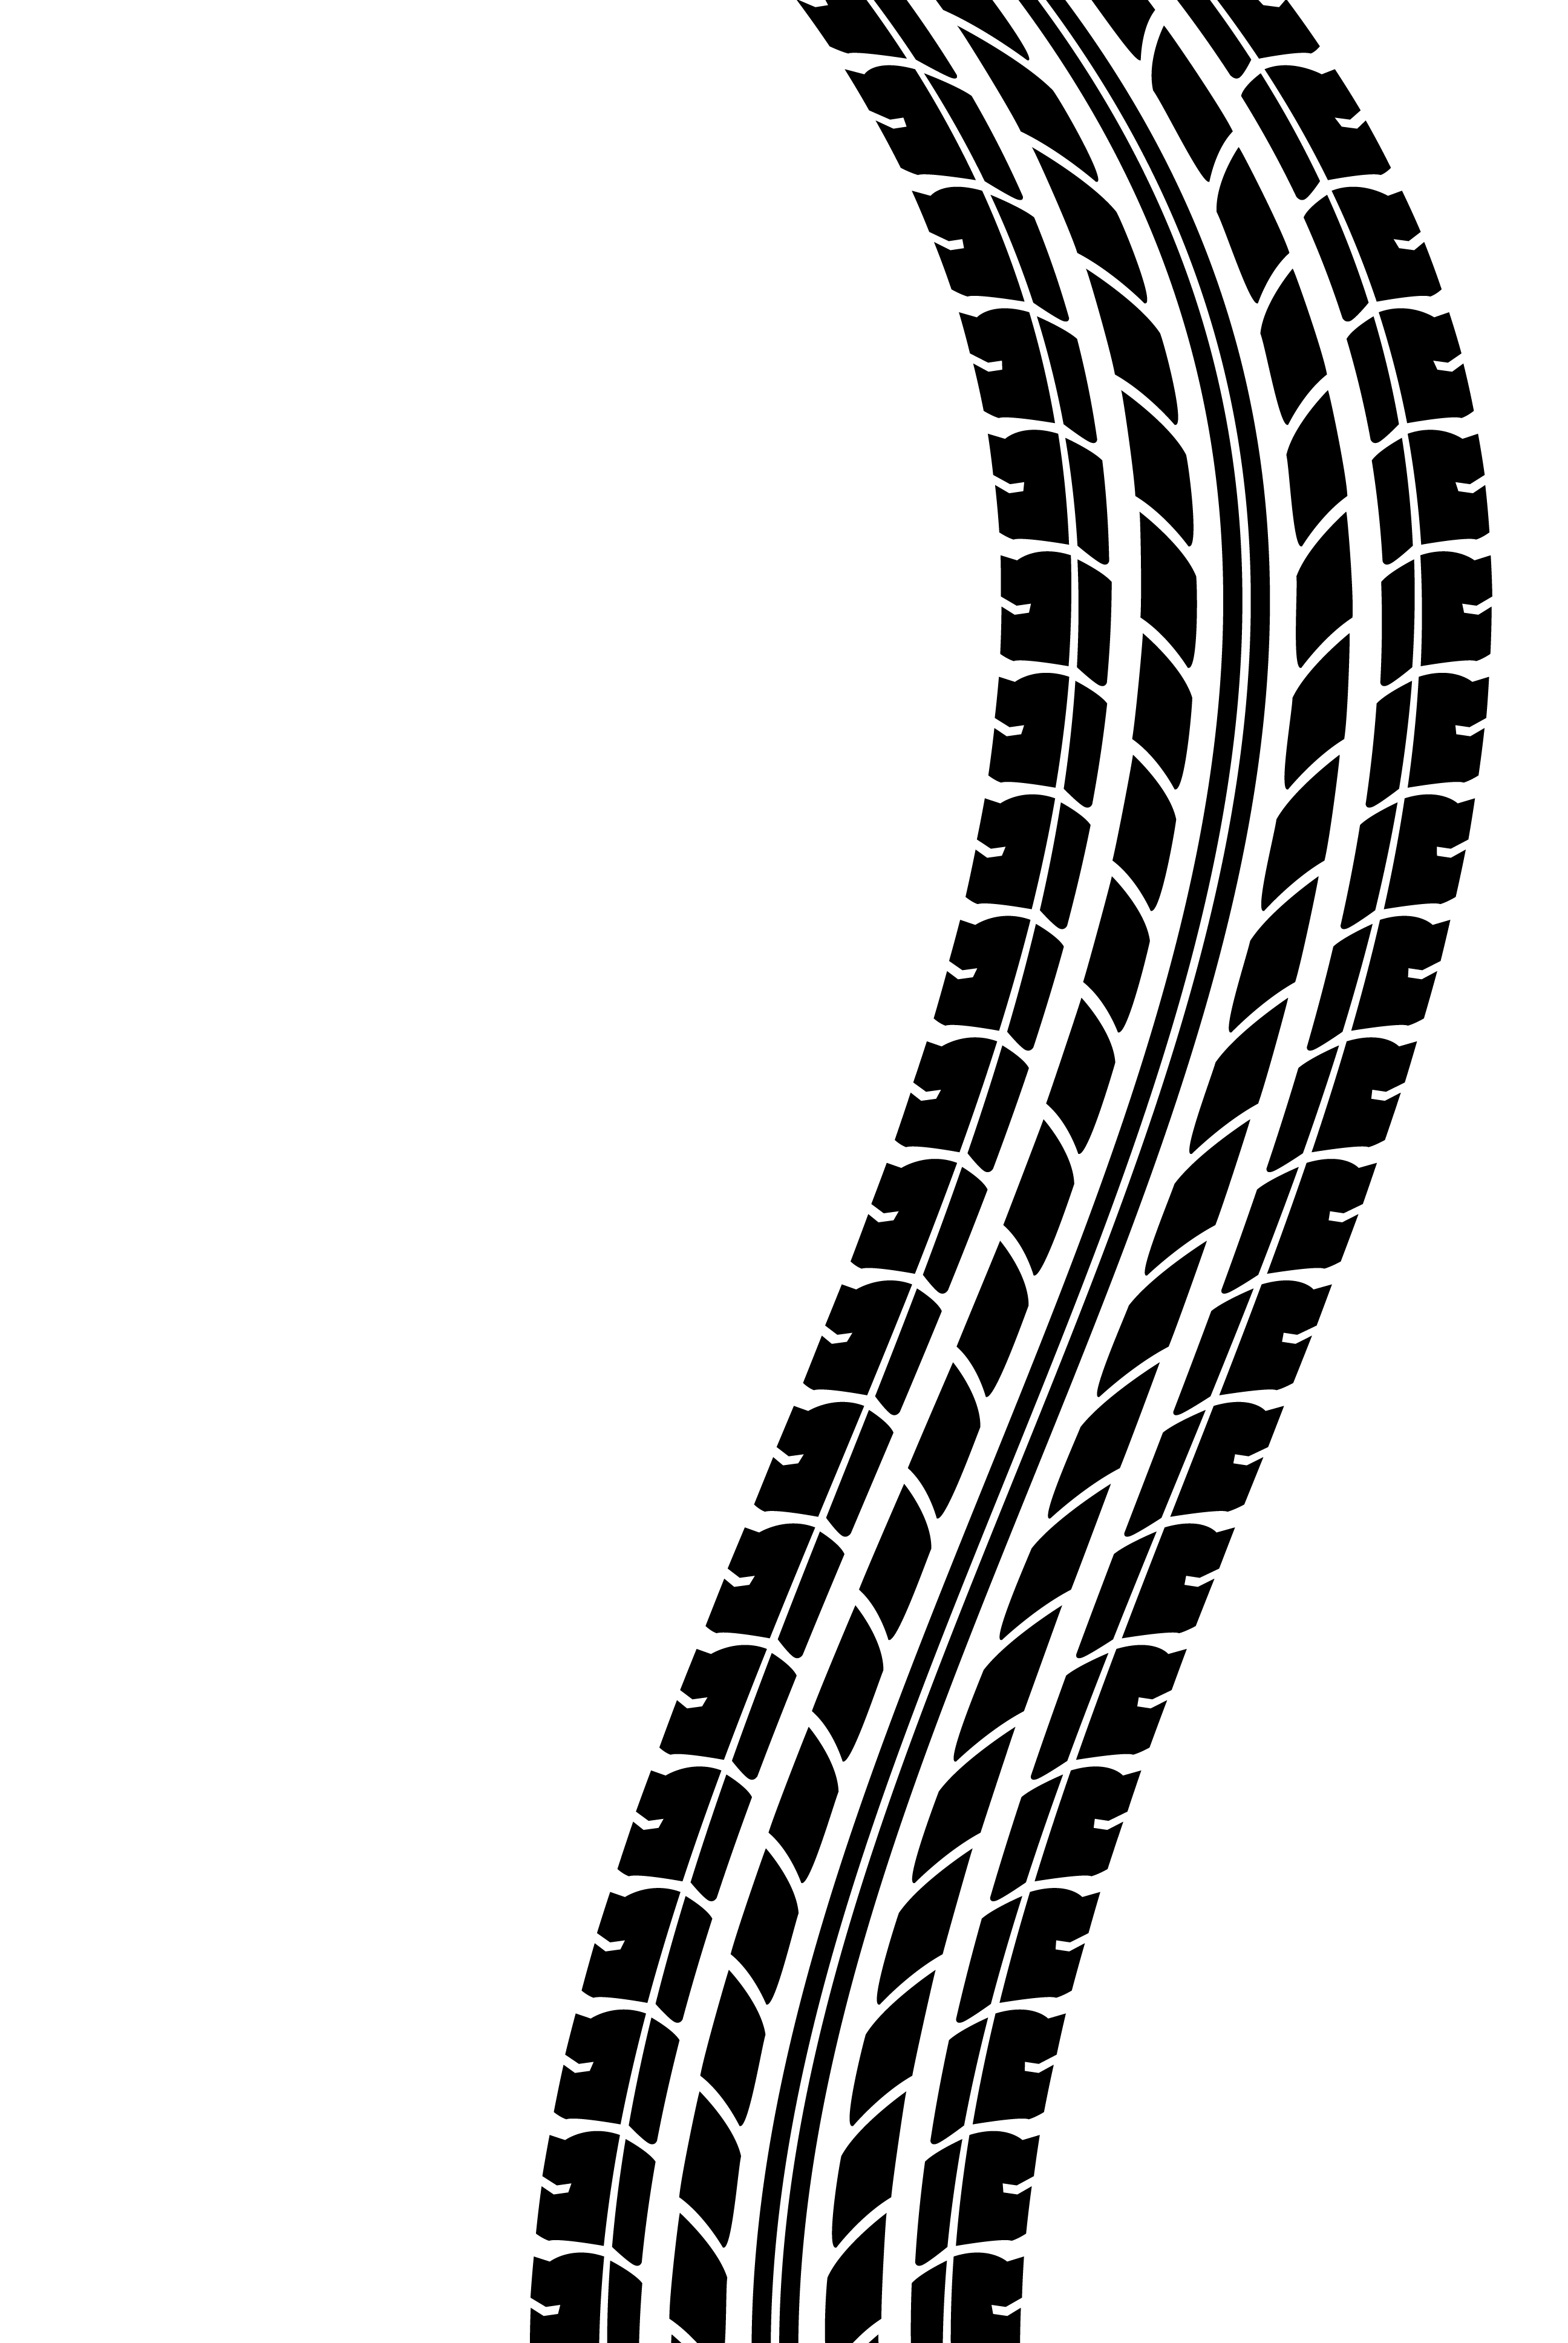 Tire Tracks Clip Art